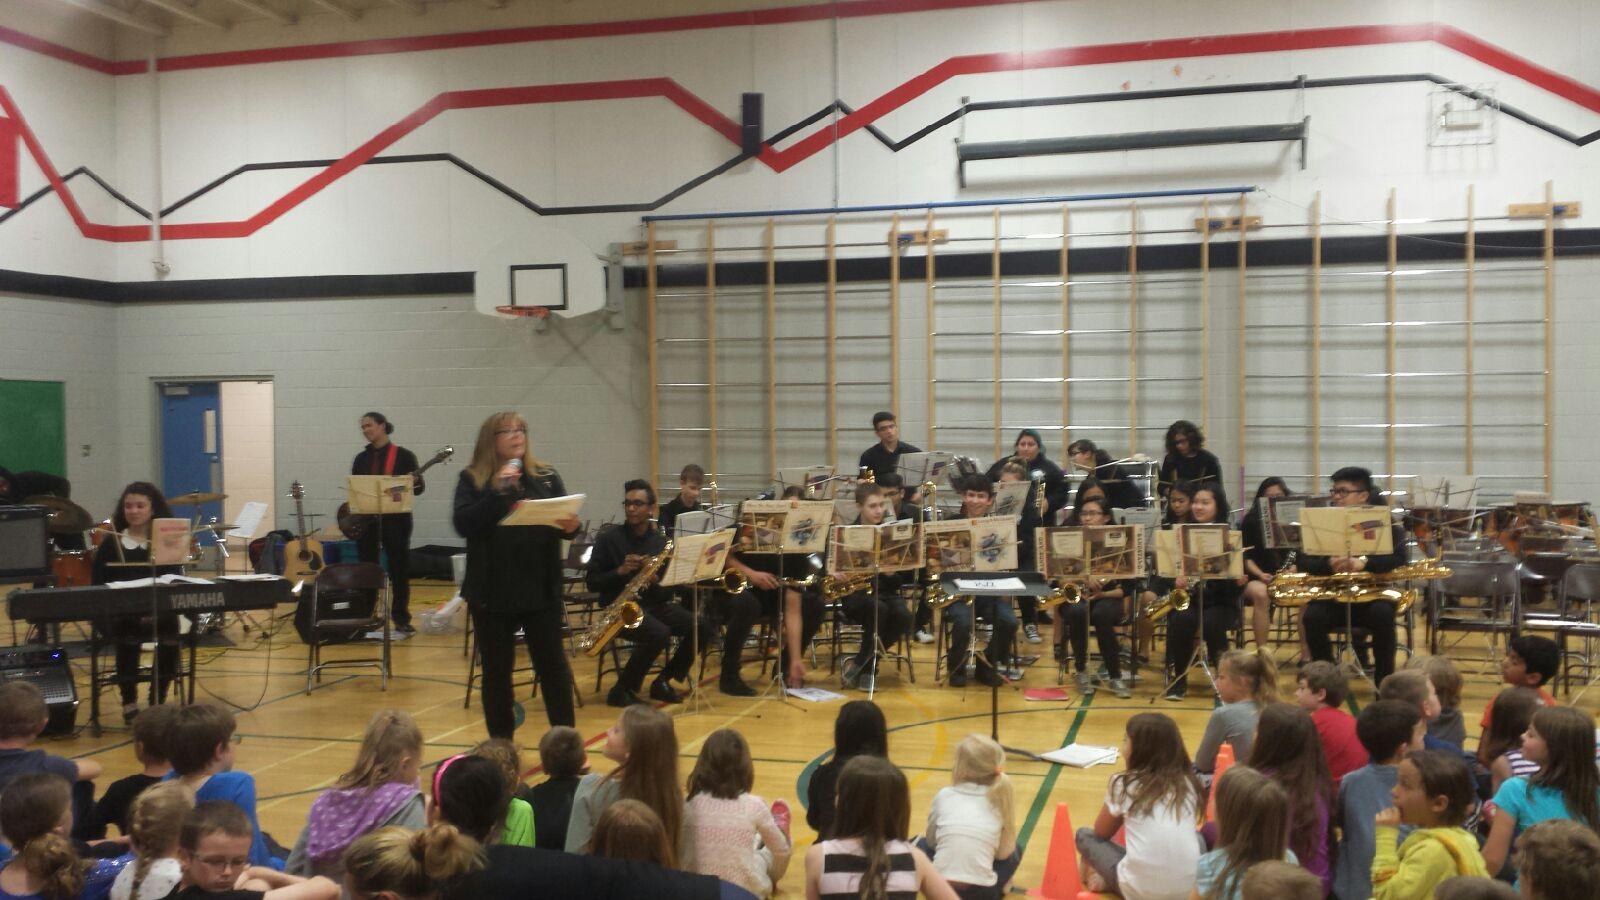 Edmonton Band Performed on Thursday, April 14